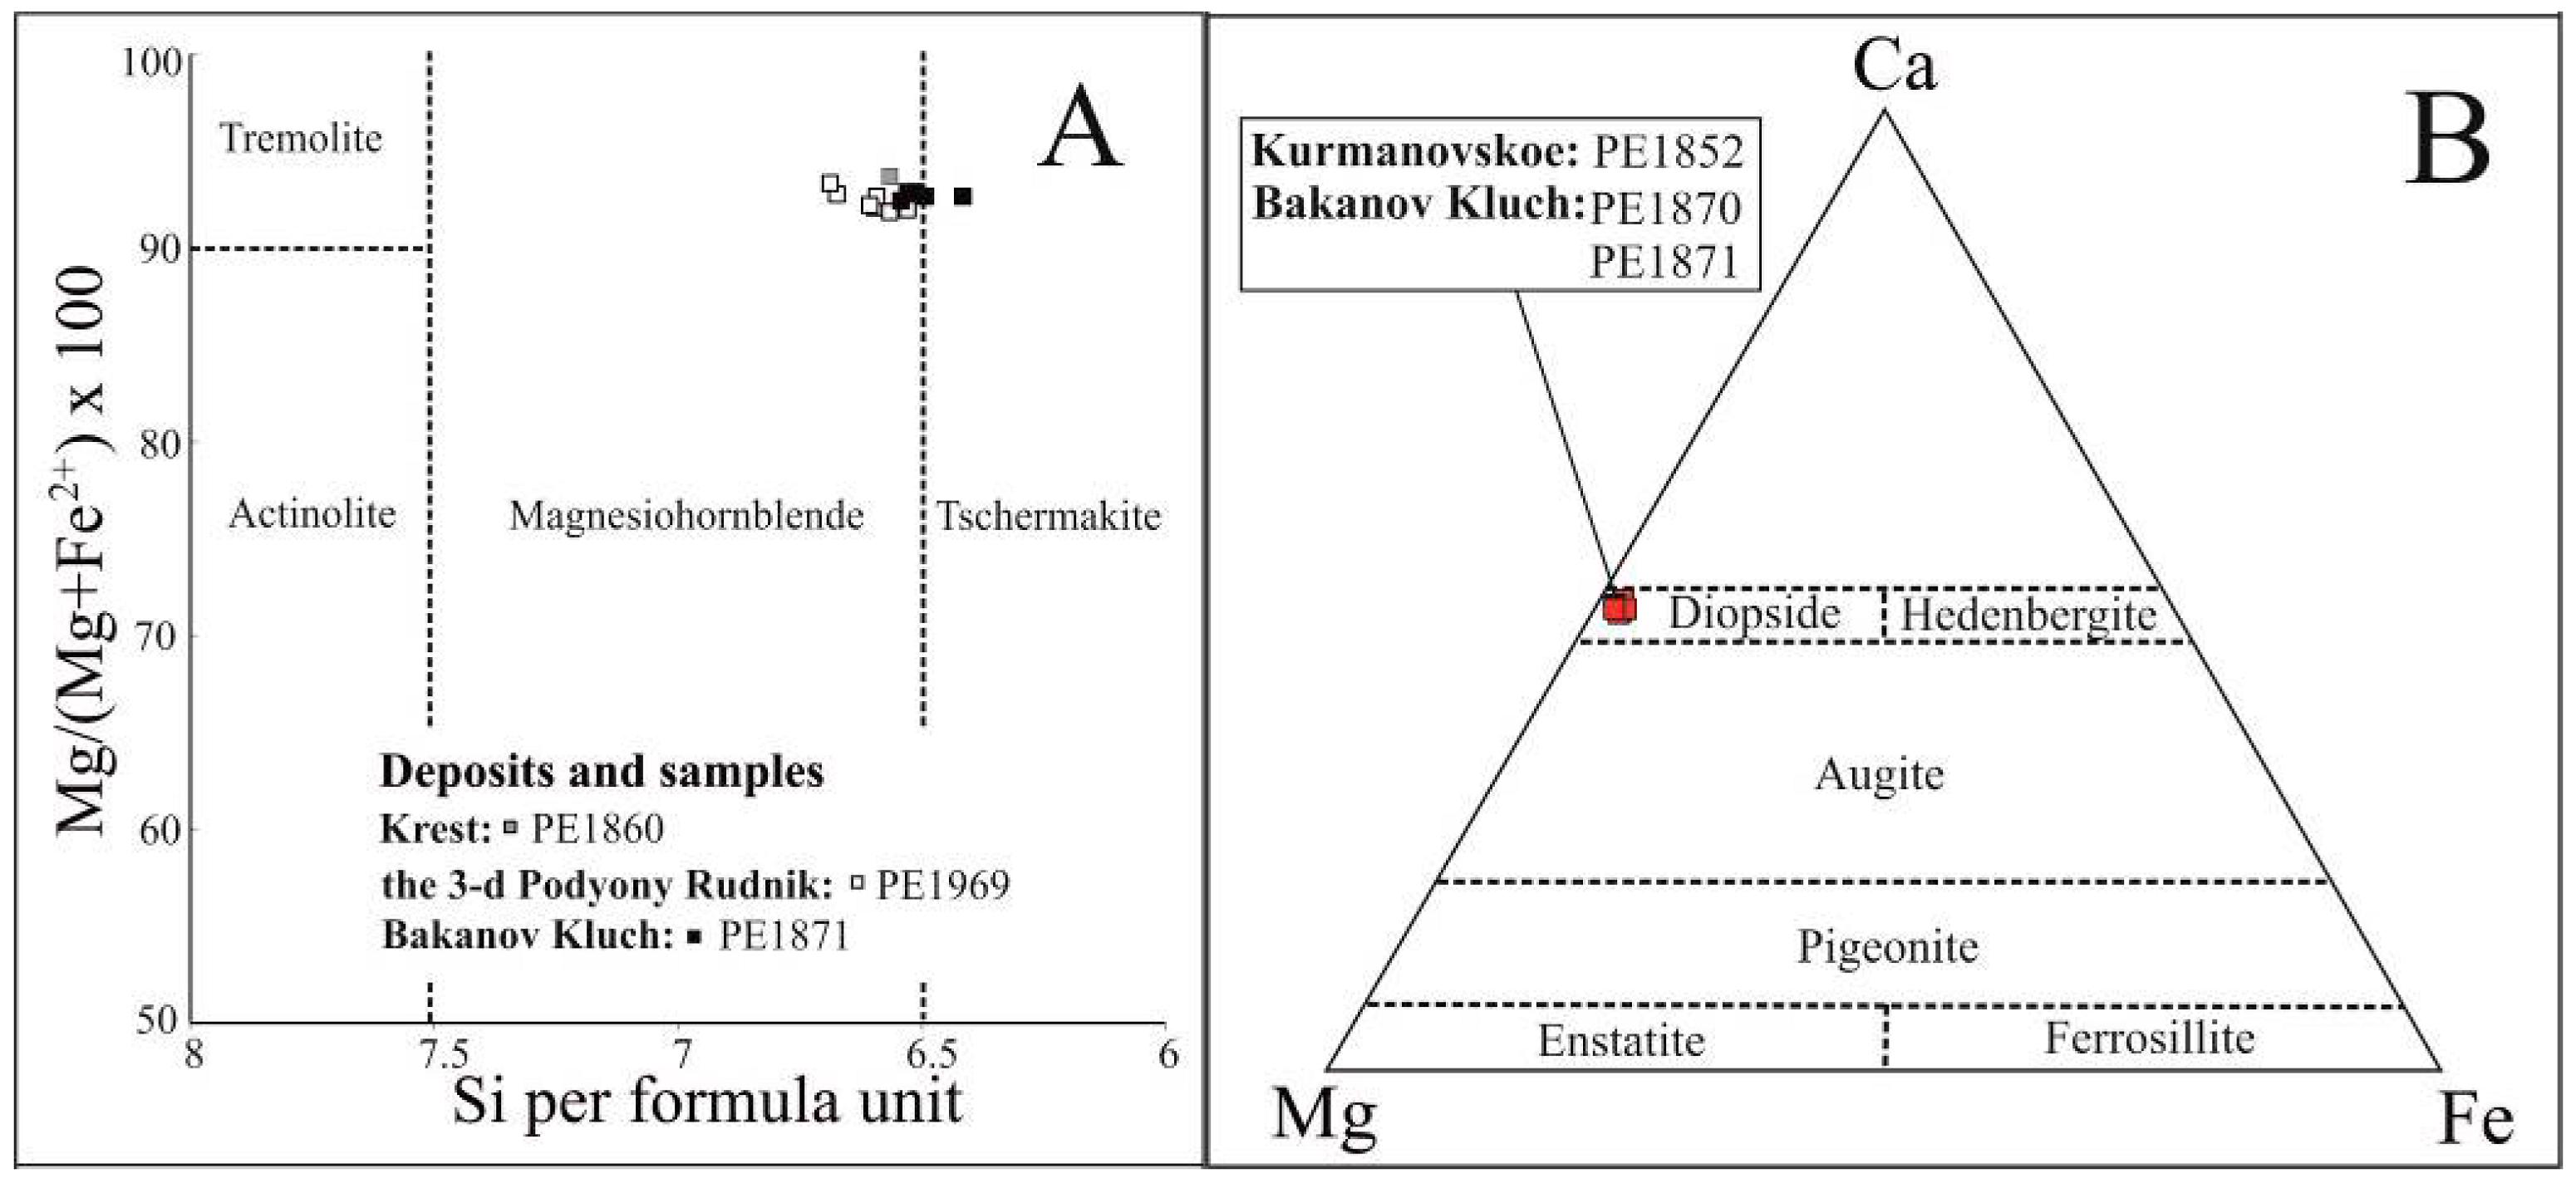 Amphibole Ternary Diagram